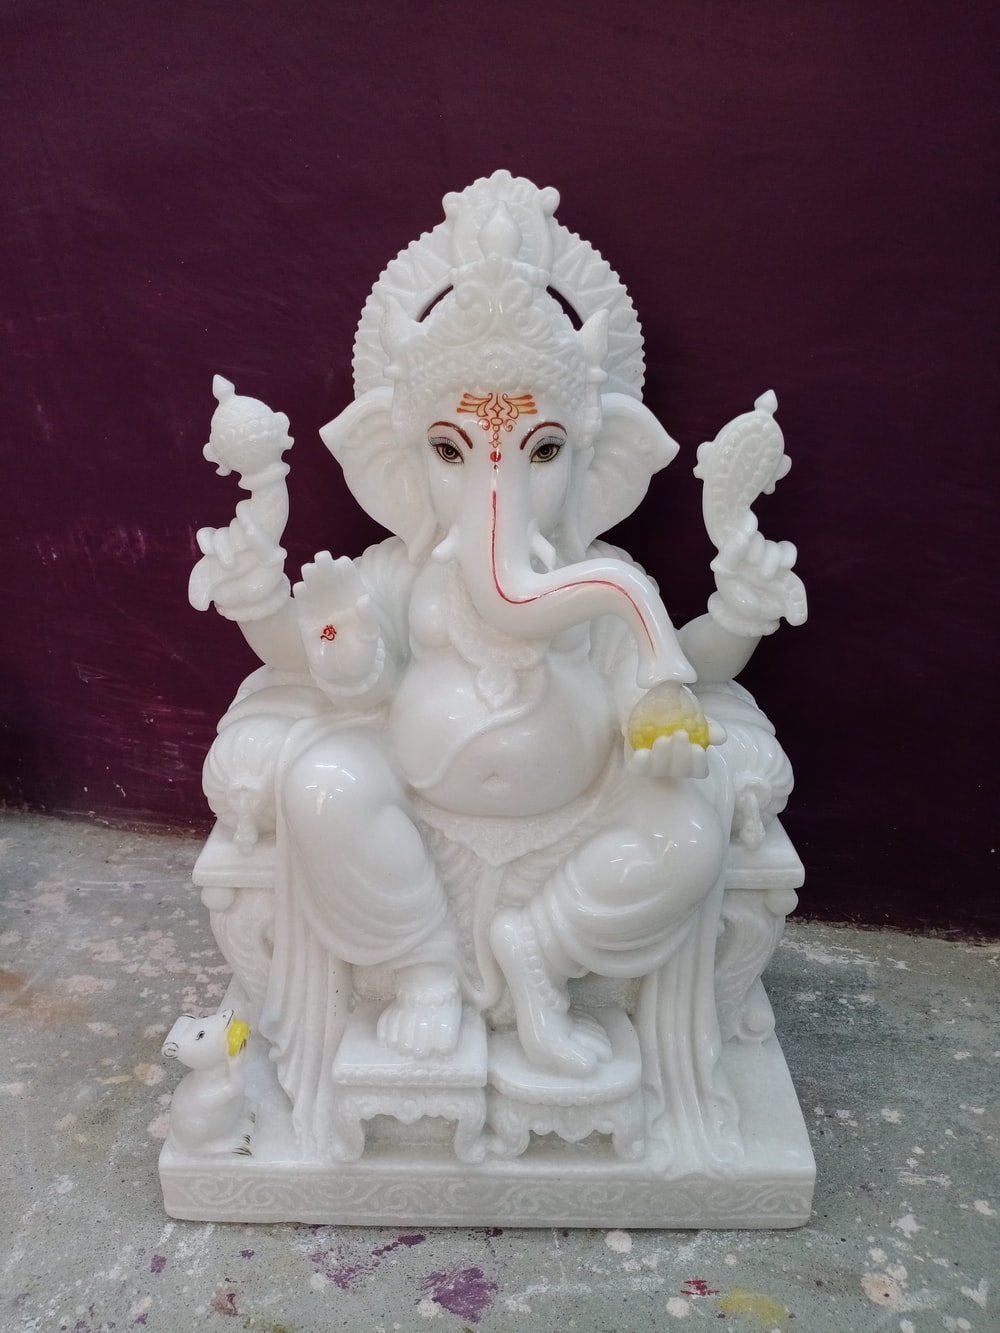 white ceramic figurine on white table